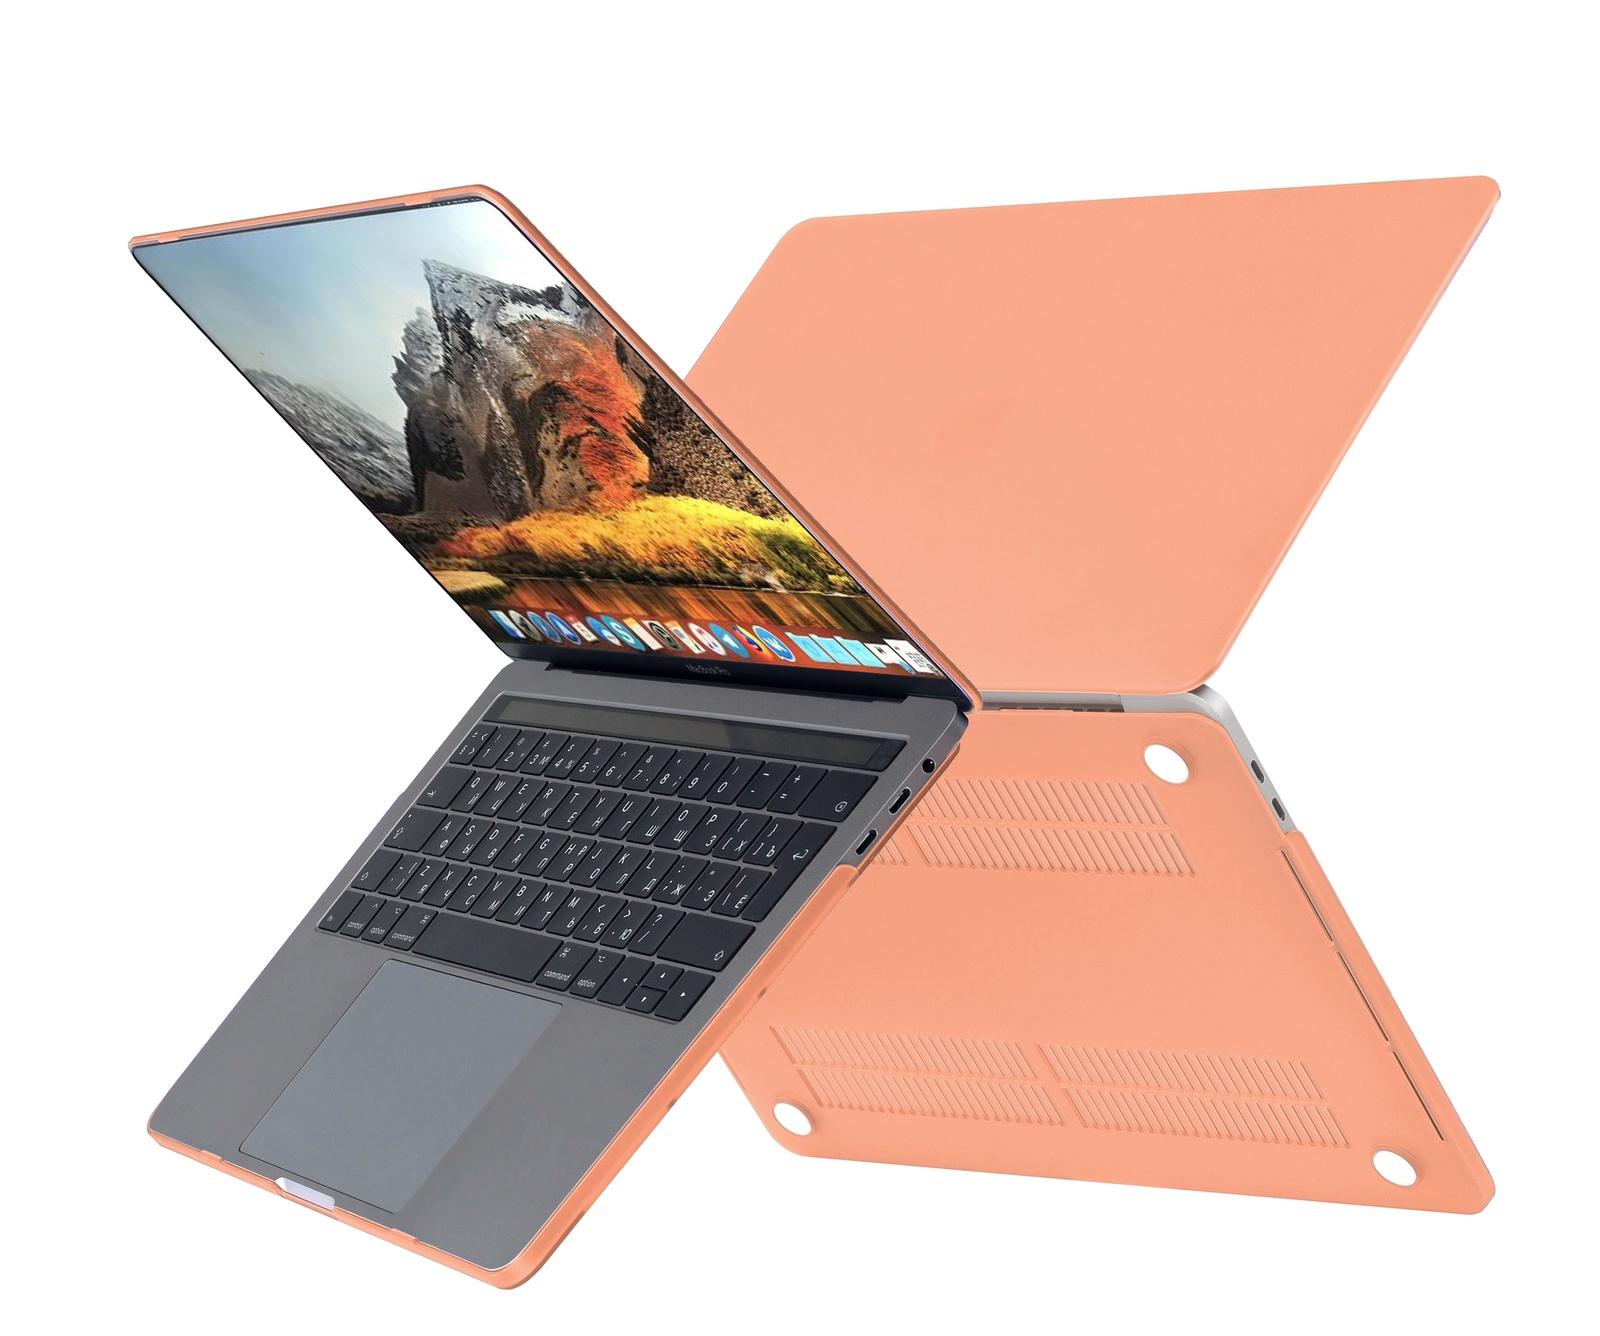 Чехол HardShell Case для Macbook Air 11, коралловый office для macbook air